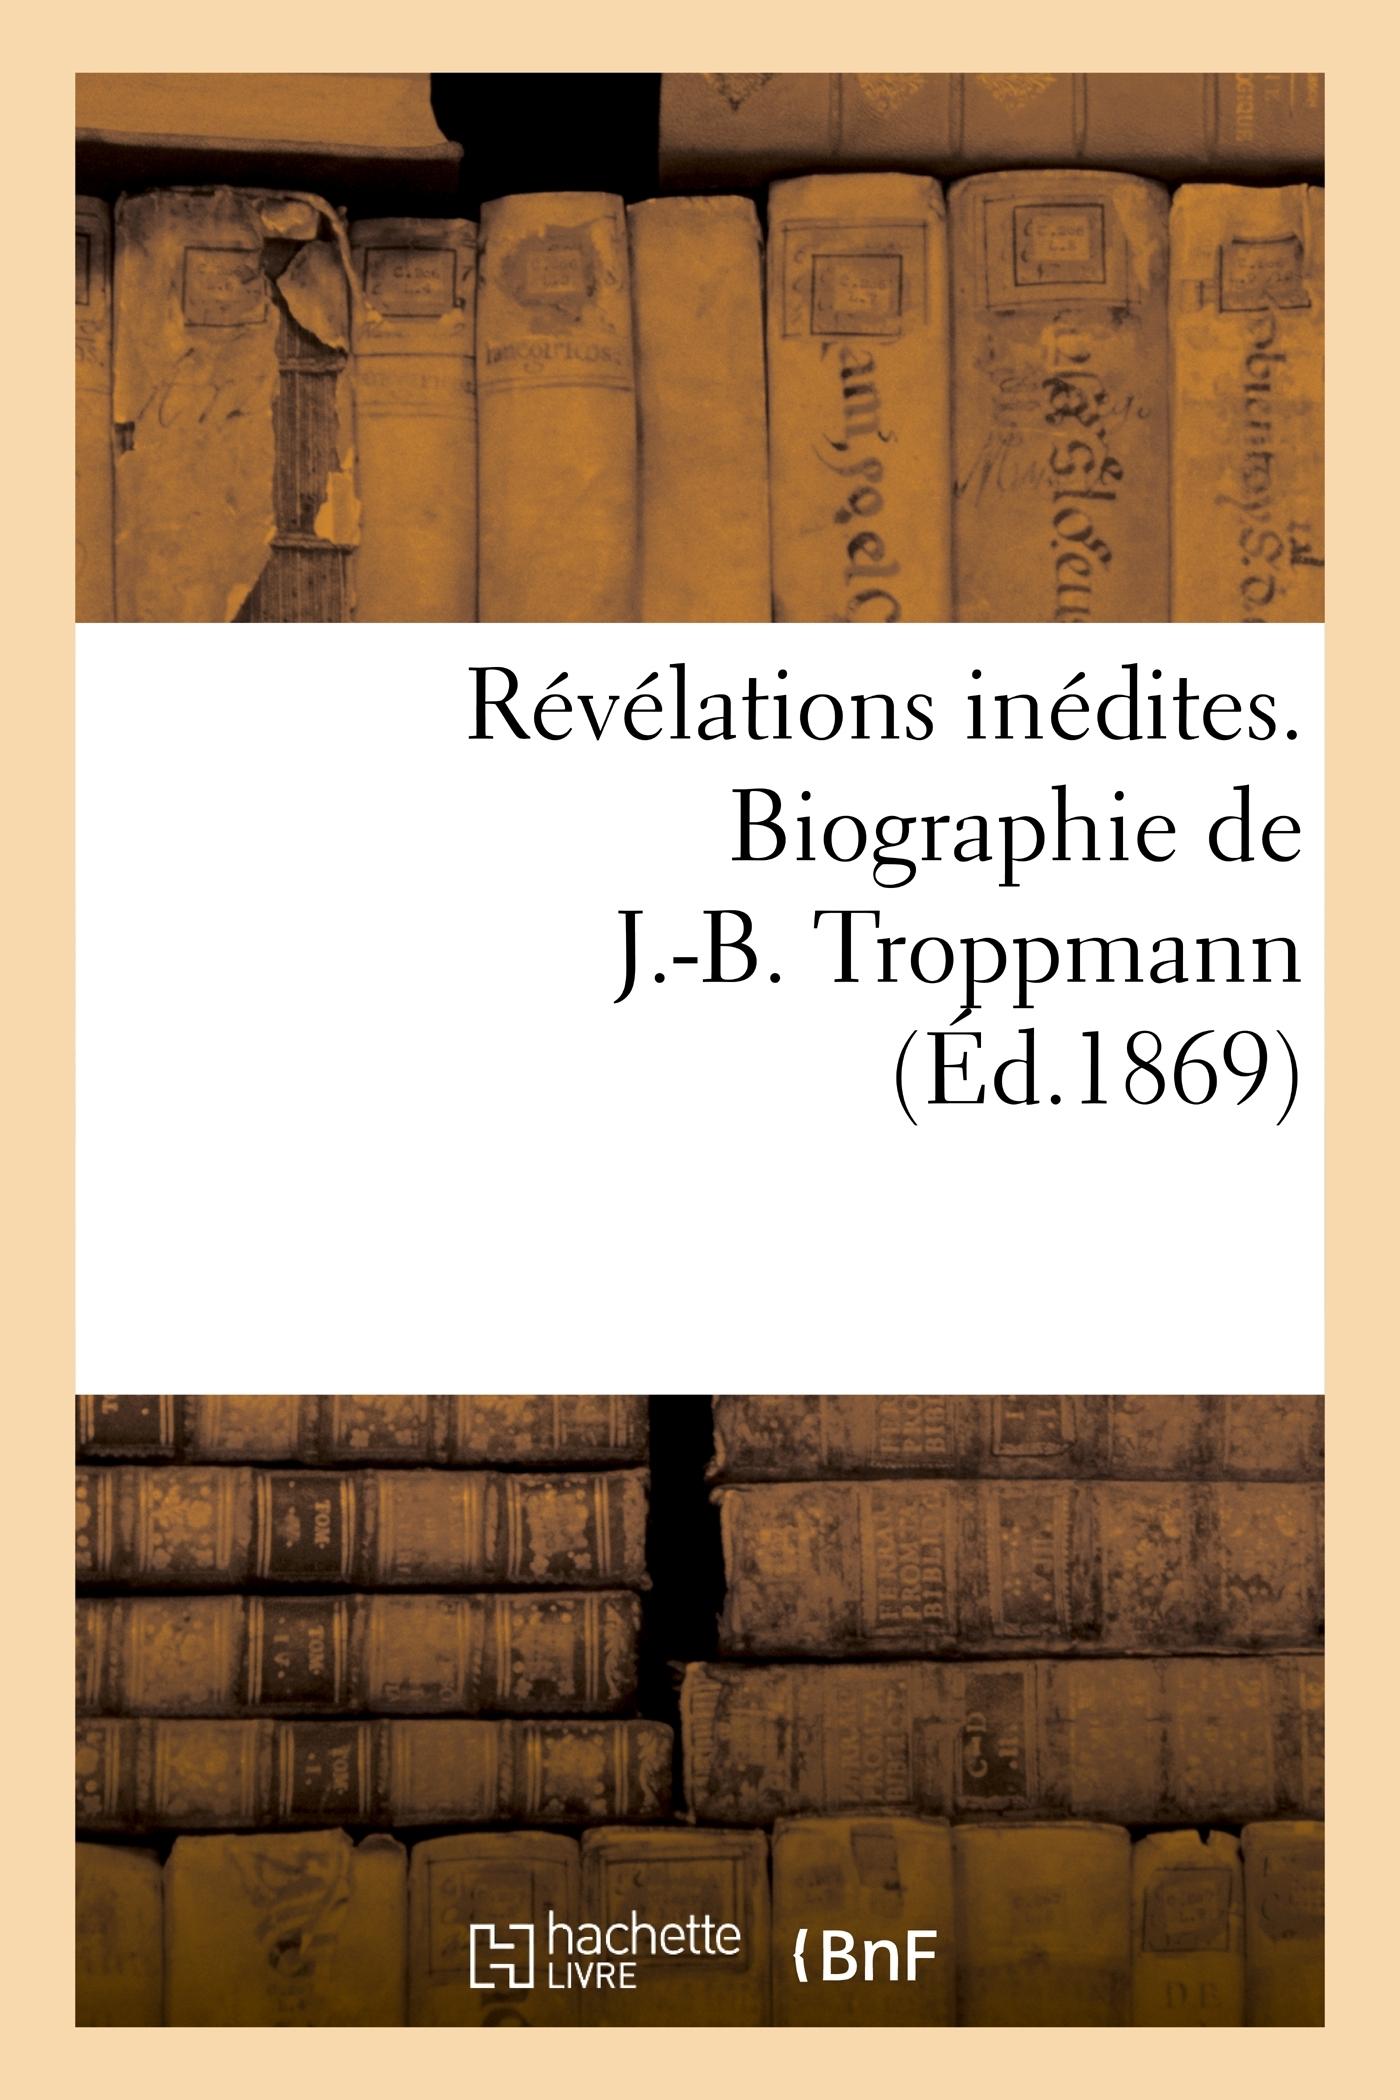 REVELATIONS INEDITES. BIOGRAPHIE DE J.-B. TROPPMANN